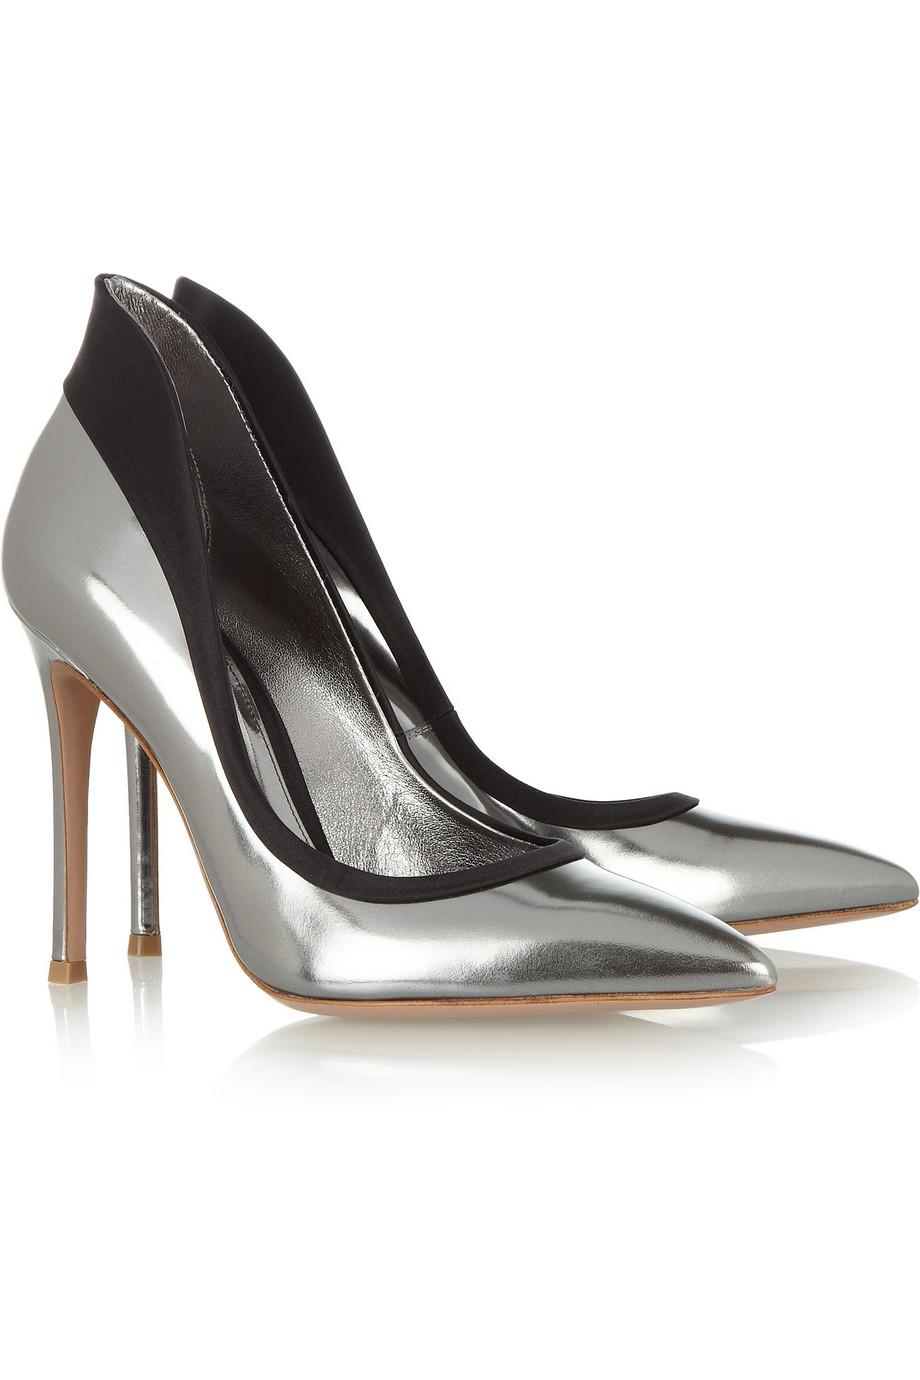 Metallic Womens Shoes Uk